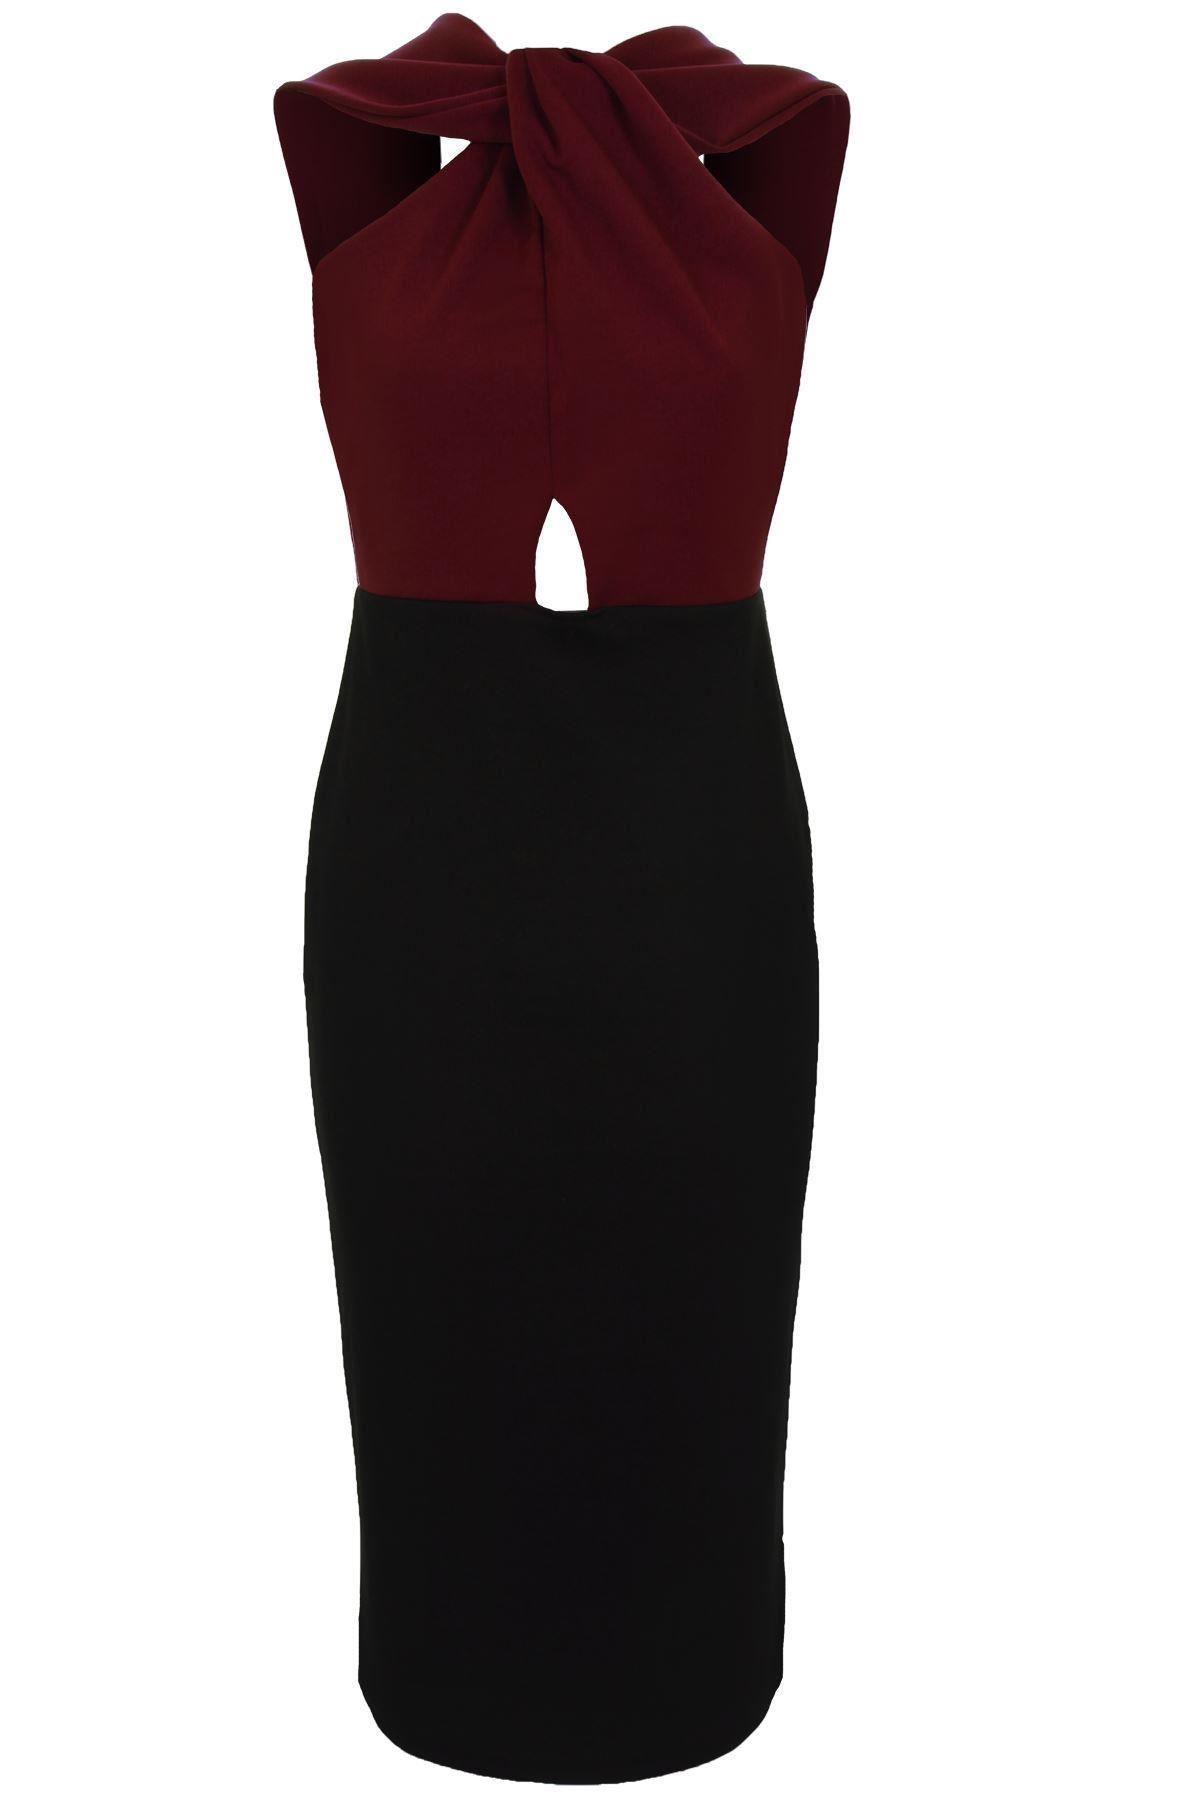 Ladies Cheryl Celeb Open Back Twist Knot Slim Contrast Bodycon Women's Dress